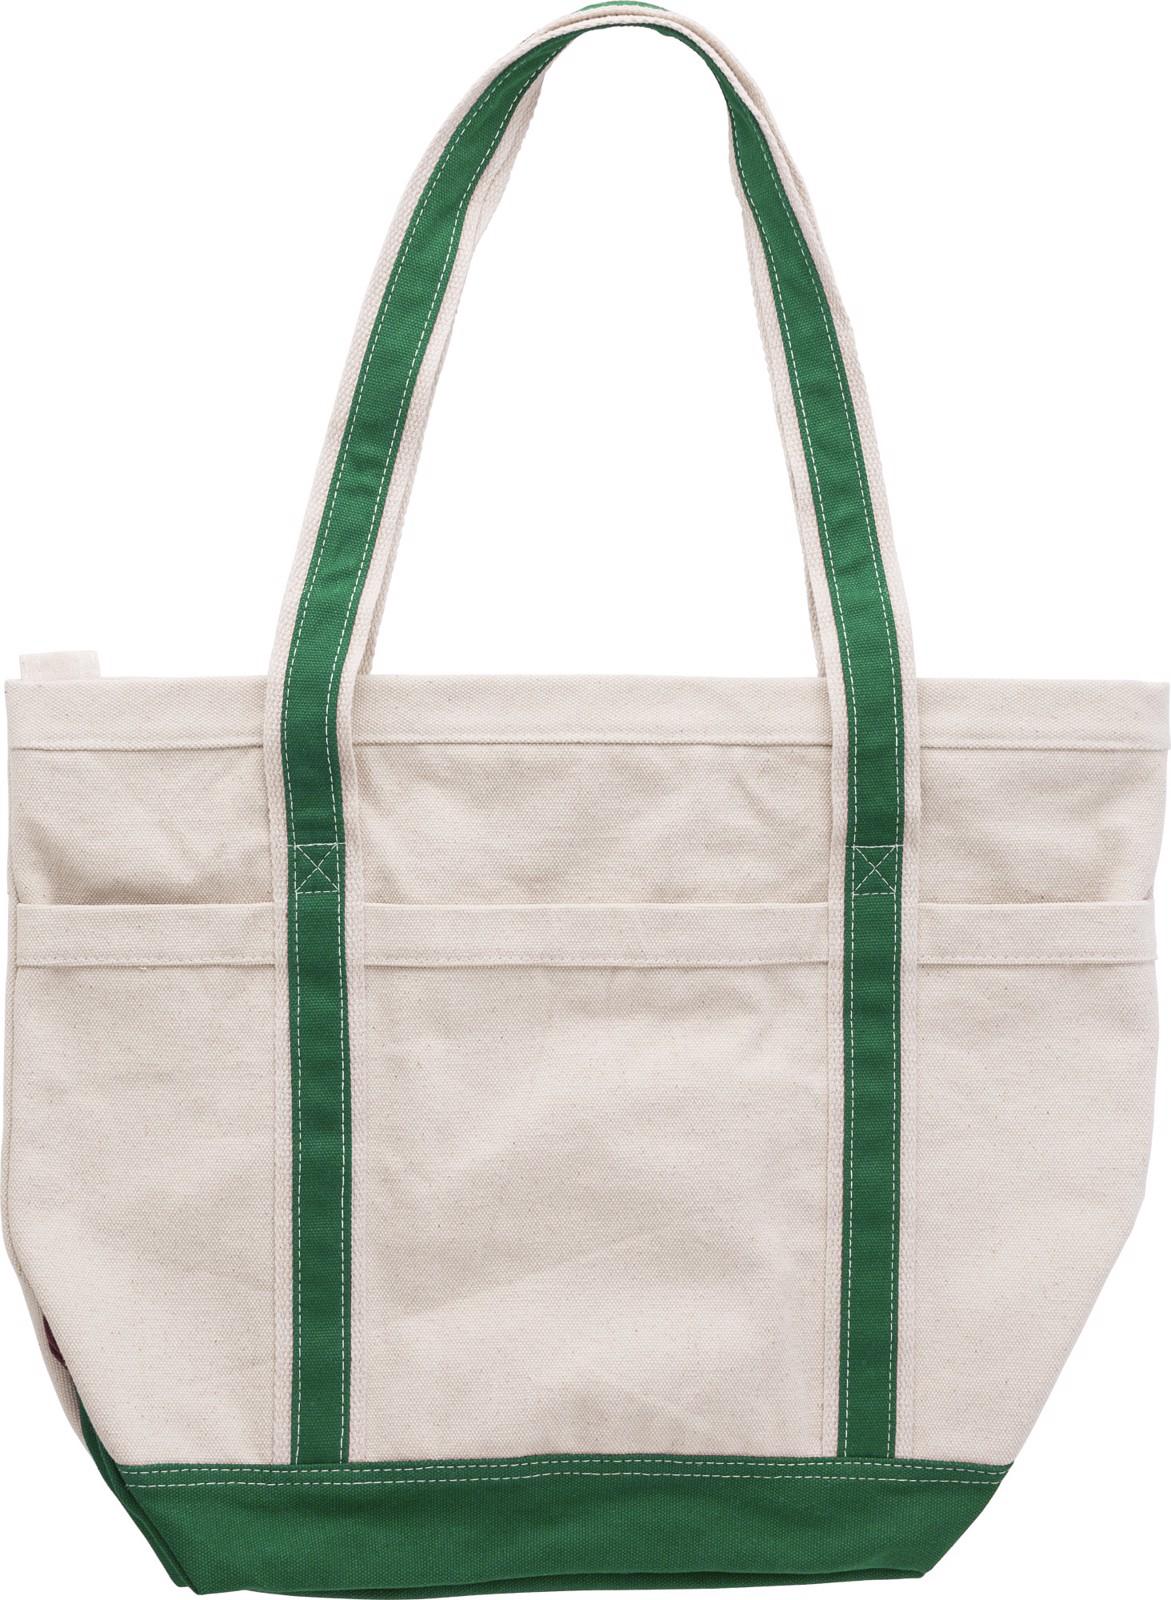 Cotton (500 gr/m²) shopping bag - Green